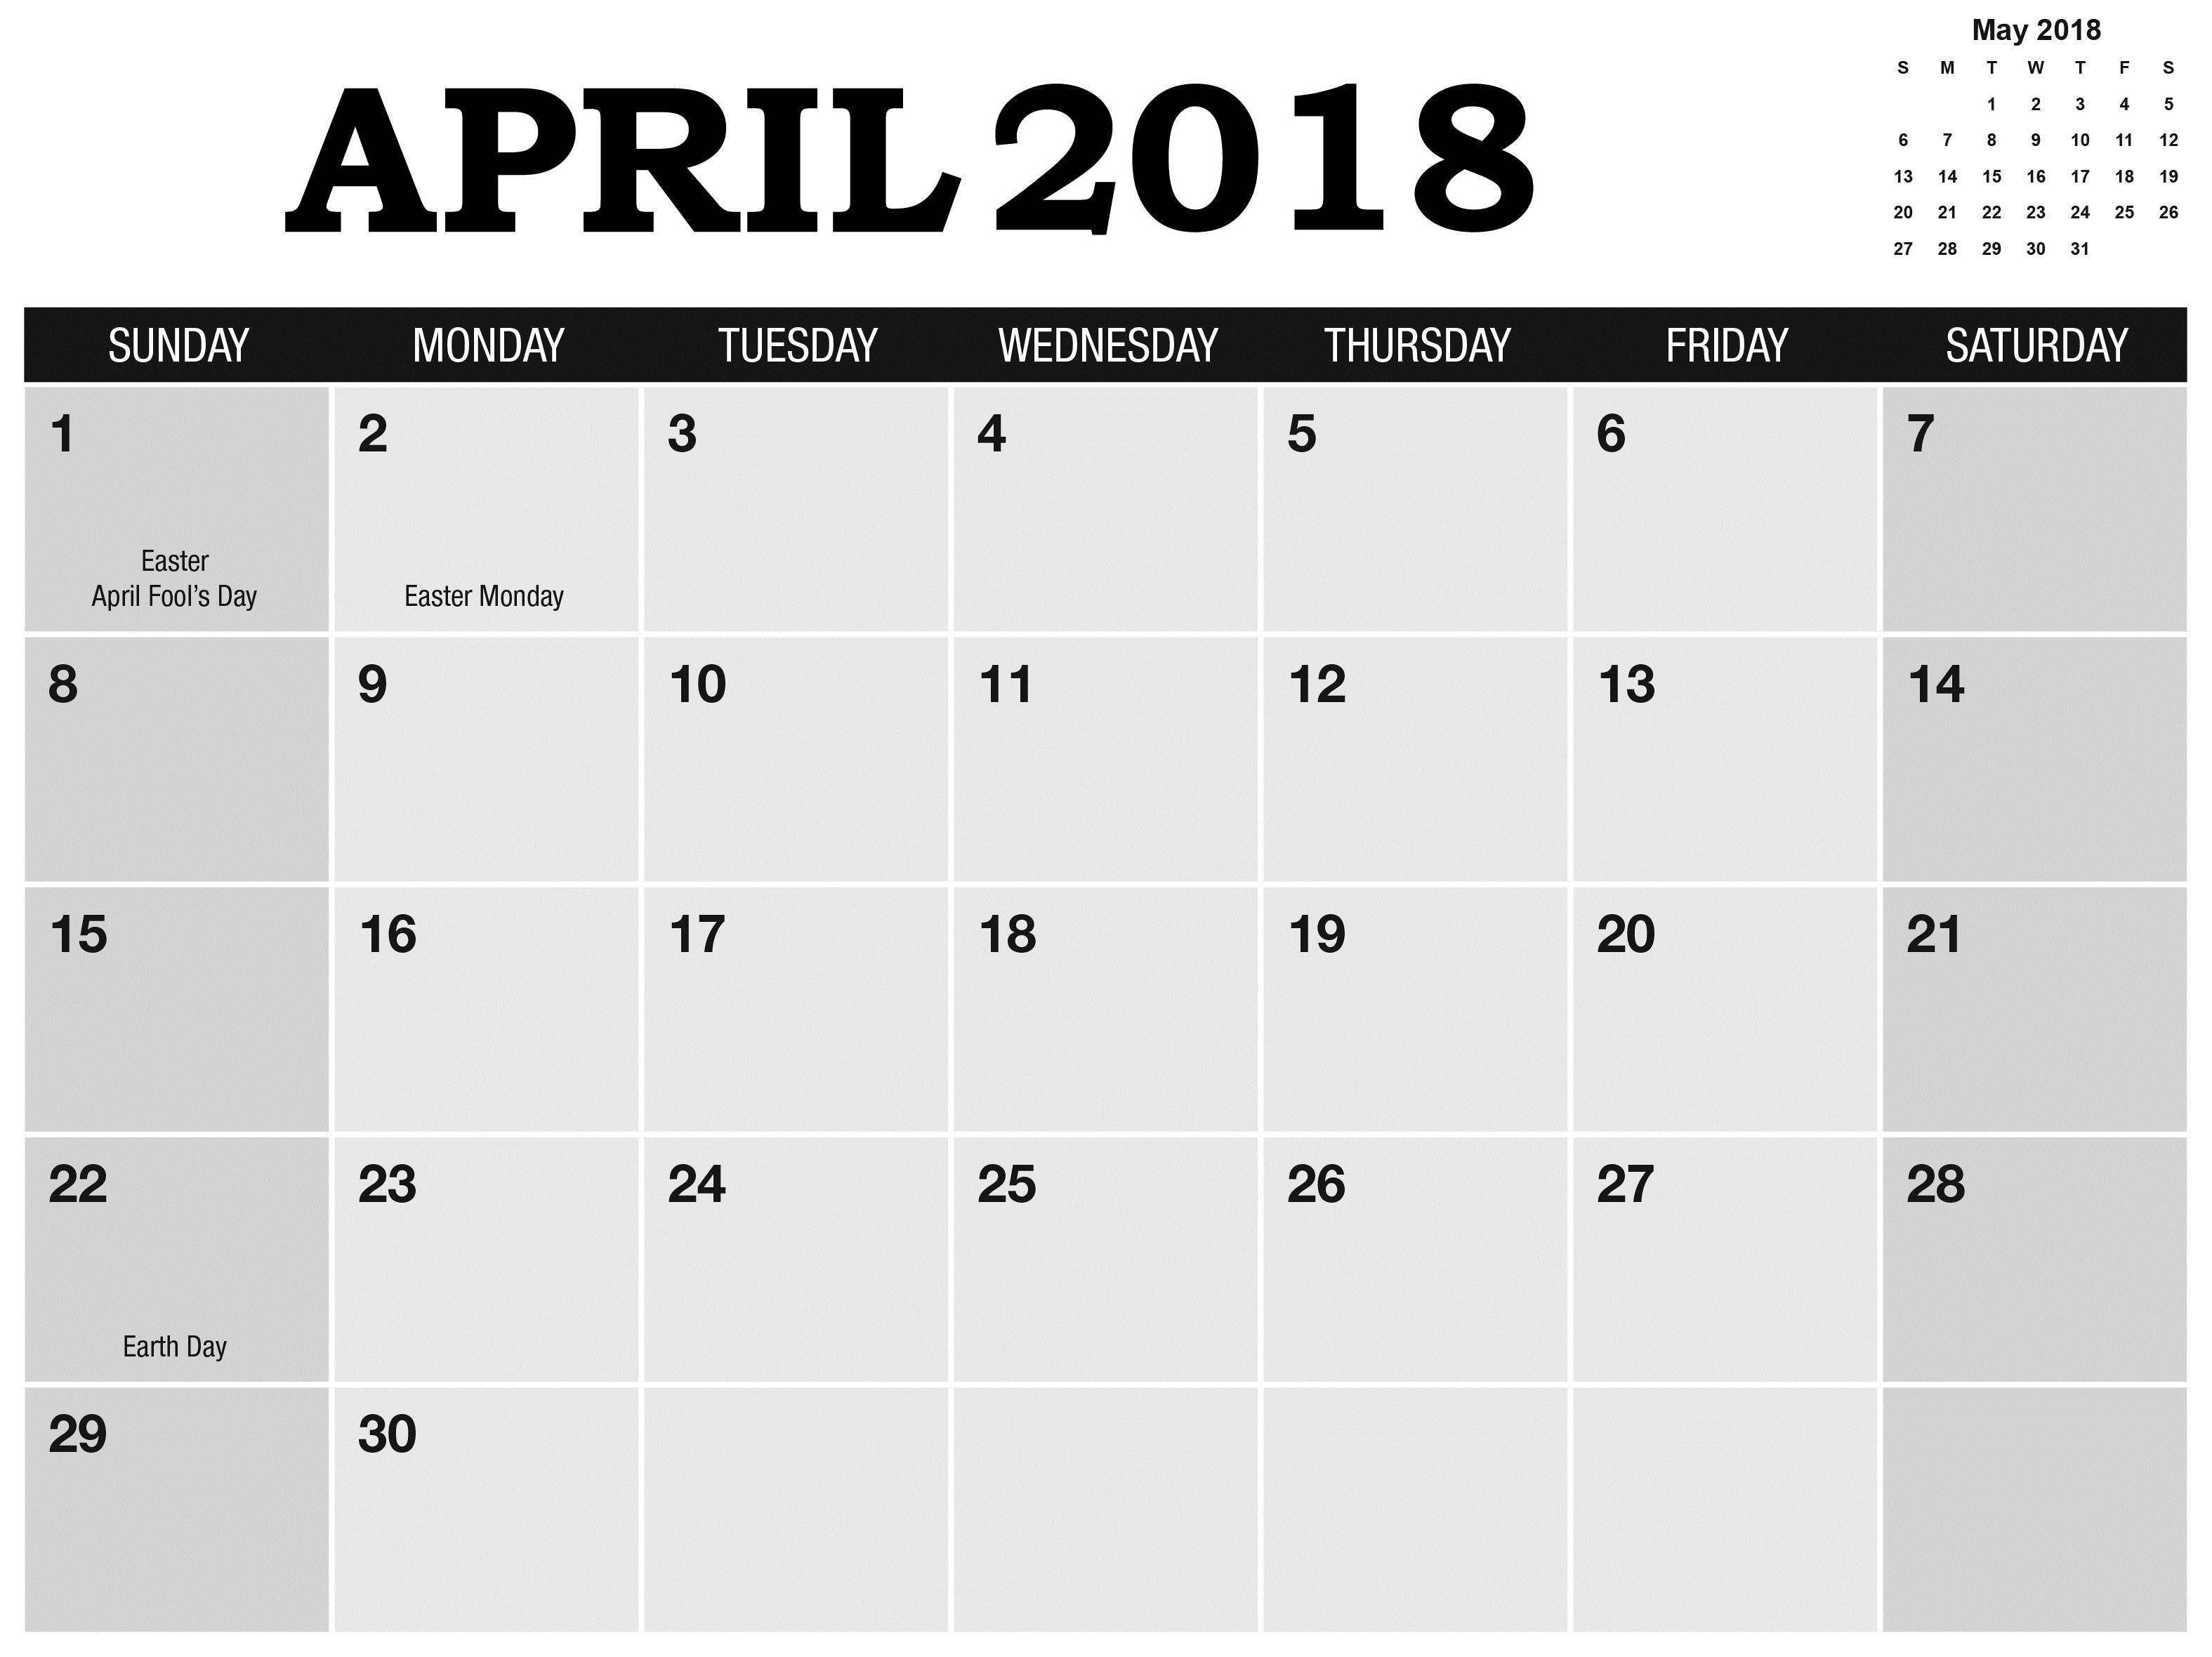 2018 April Holidays Calendar